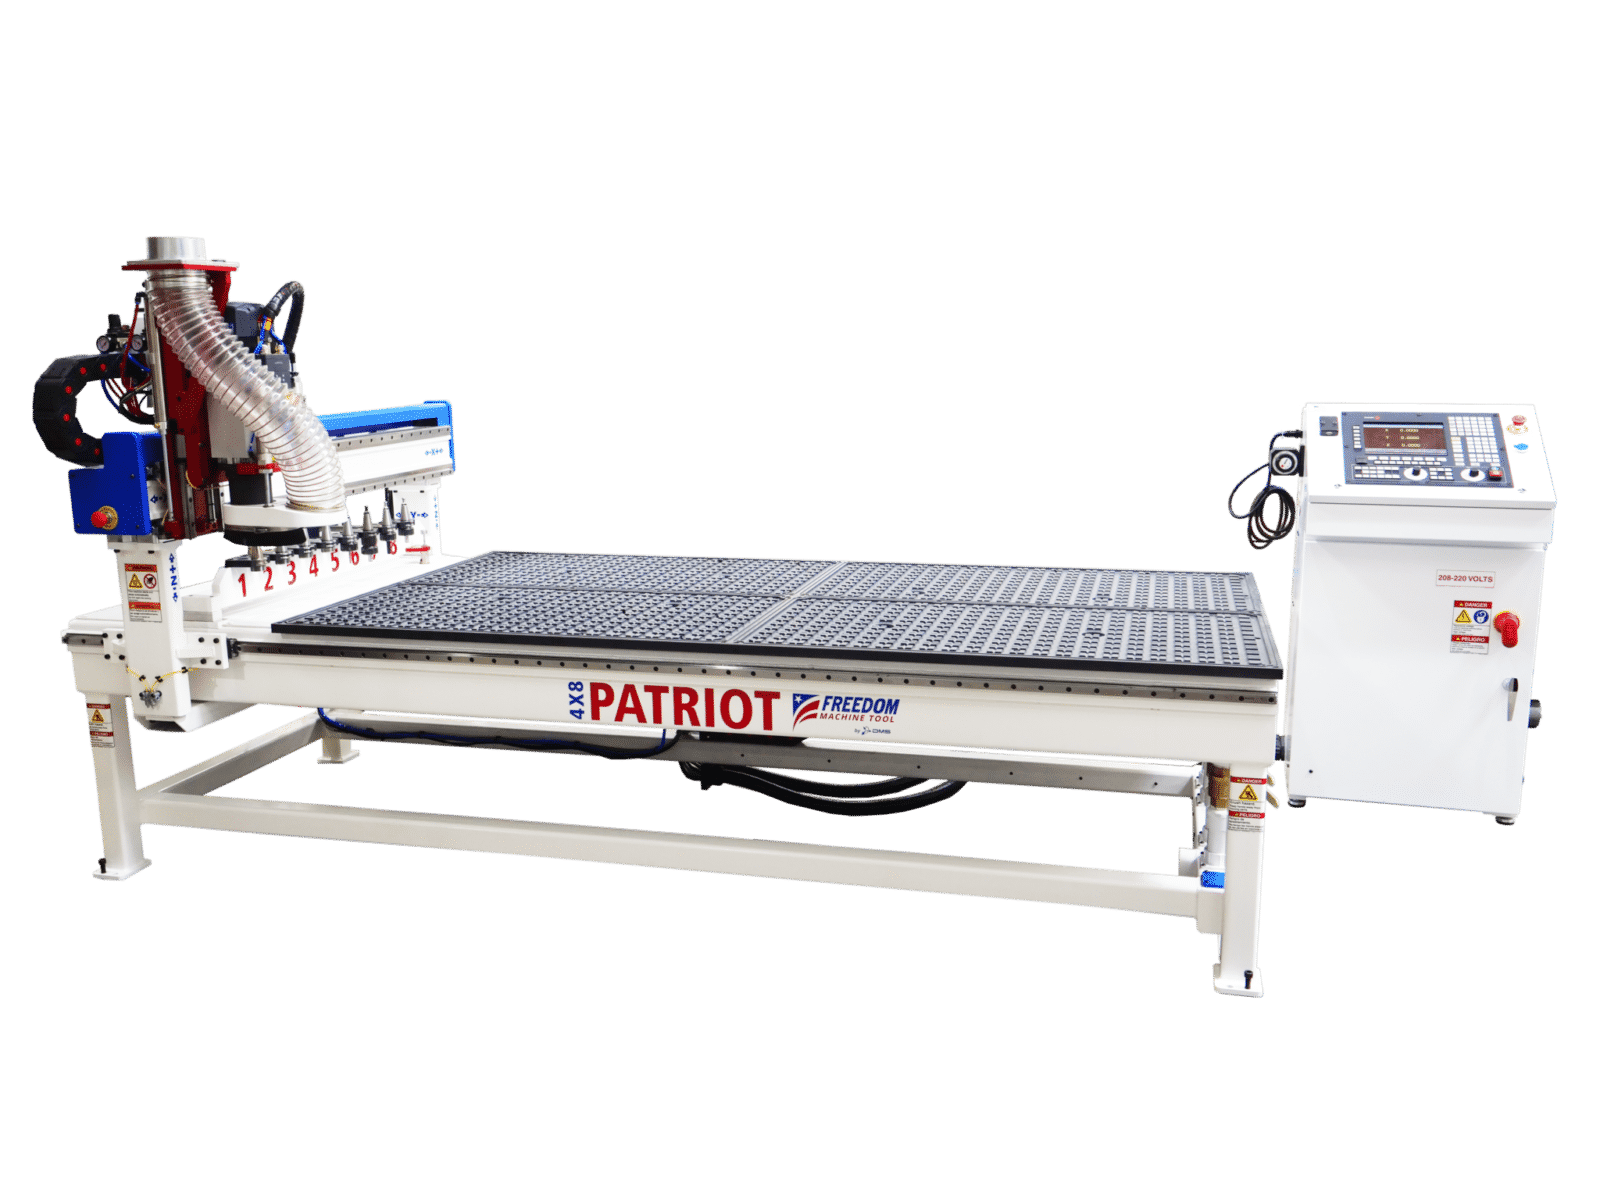 Freedom Machine Tool Patriot Router